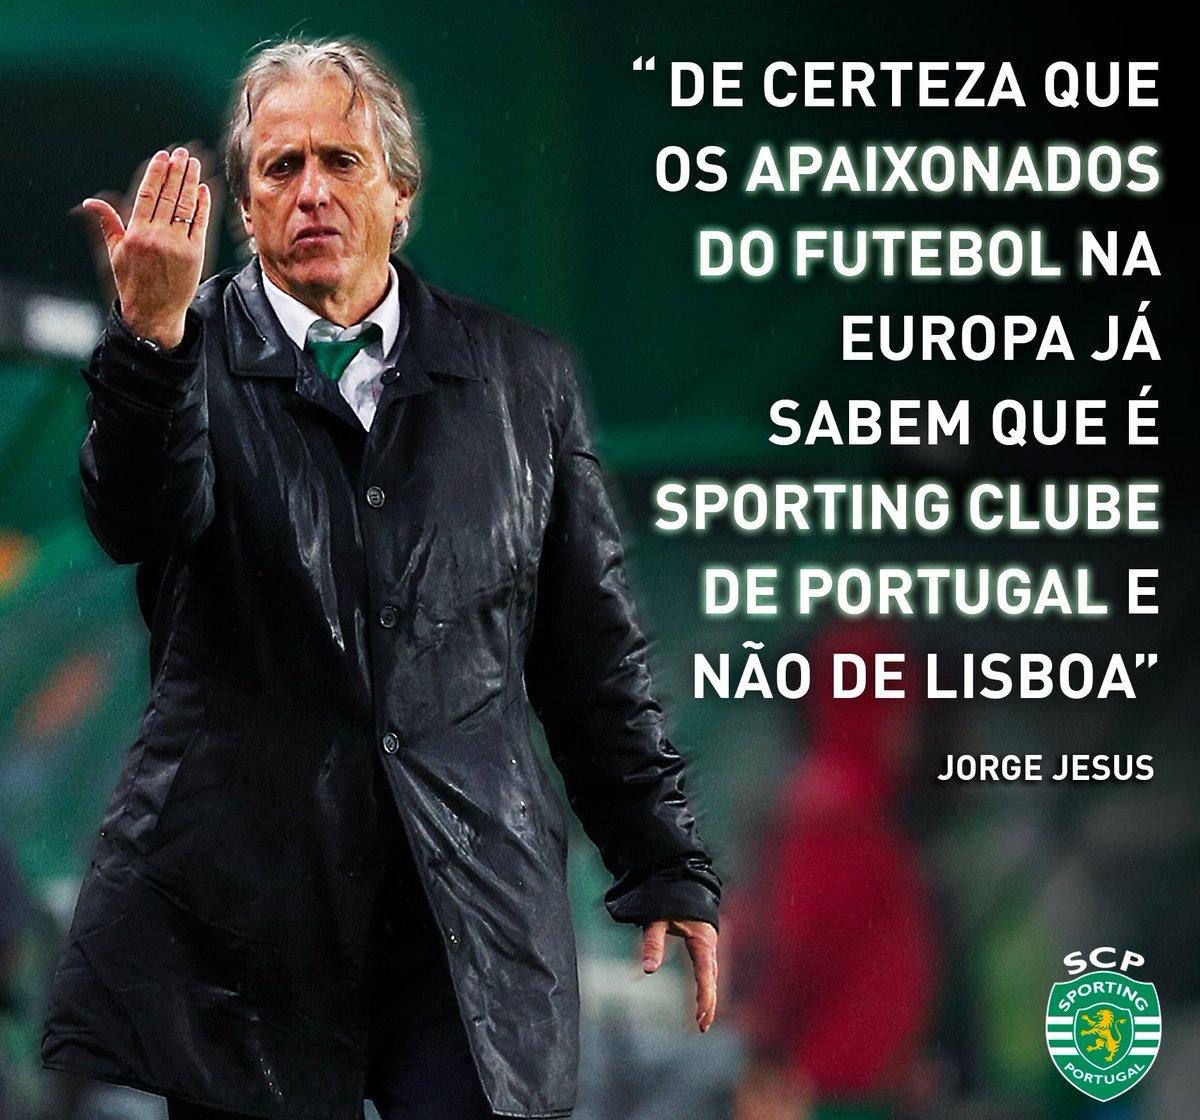 Fomos Sporting Clube de Portugal! 🇵🇹 🙌